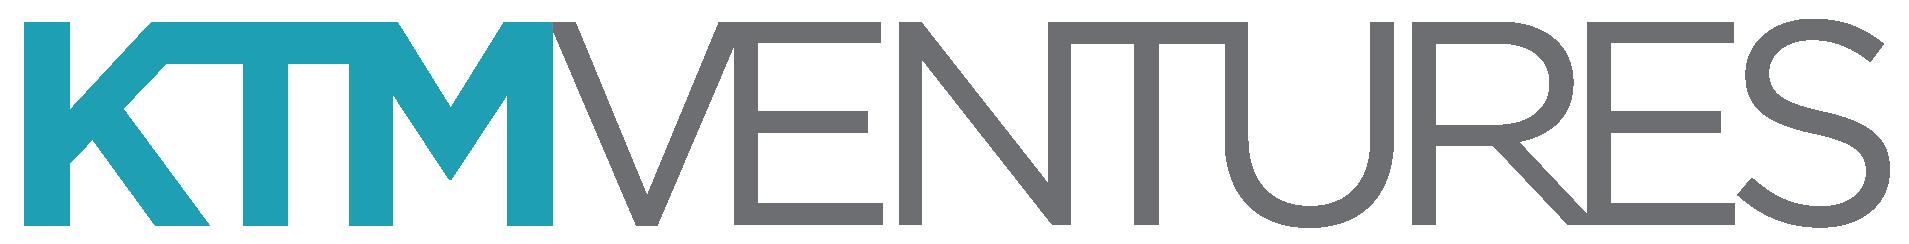 ktm-ventures-logo